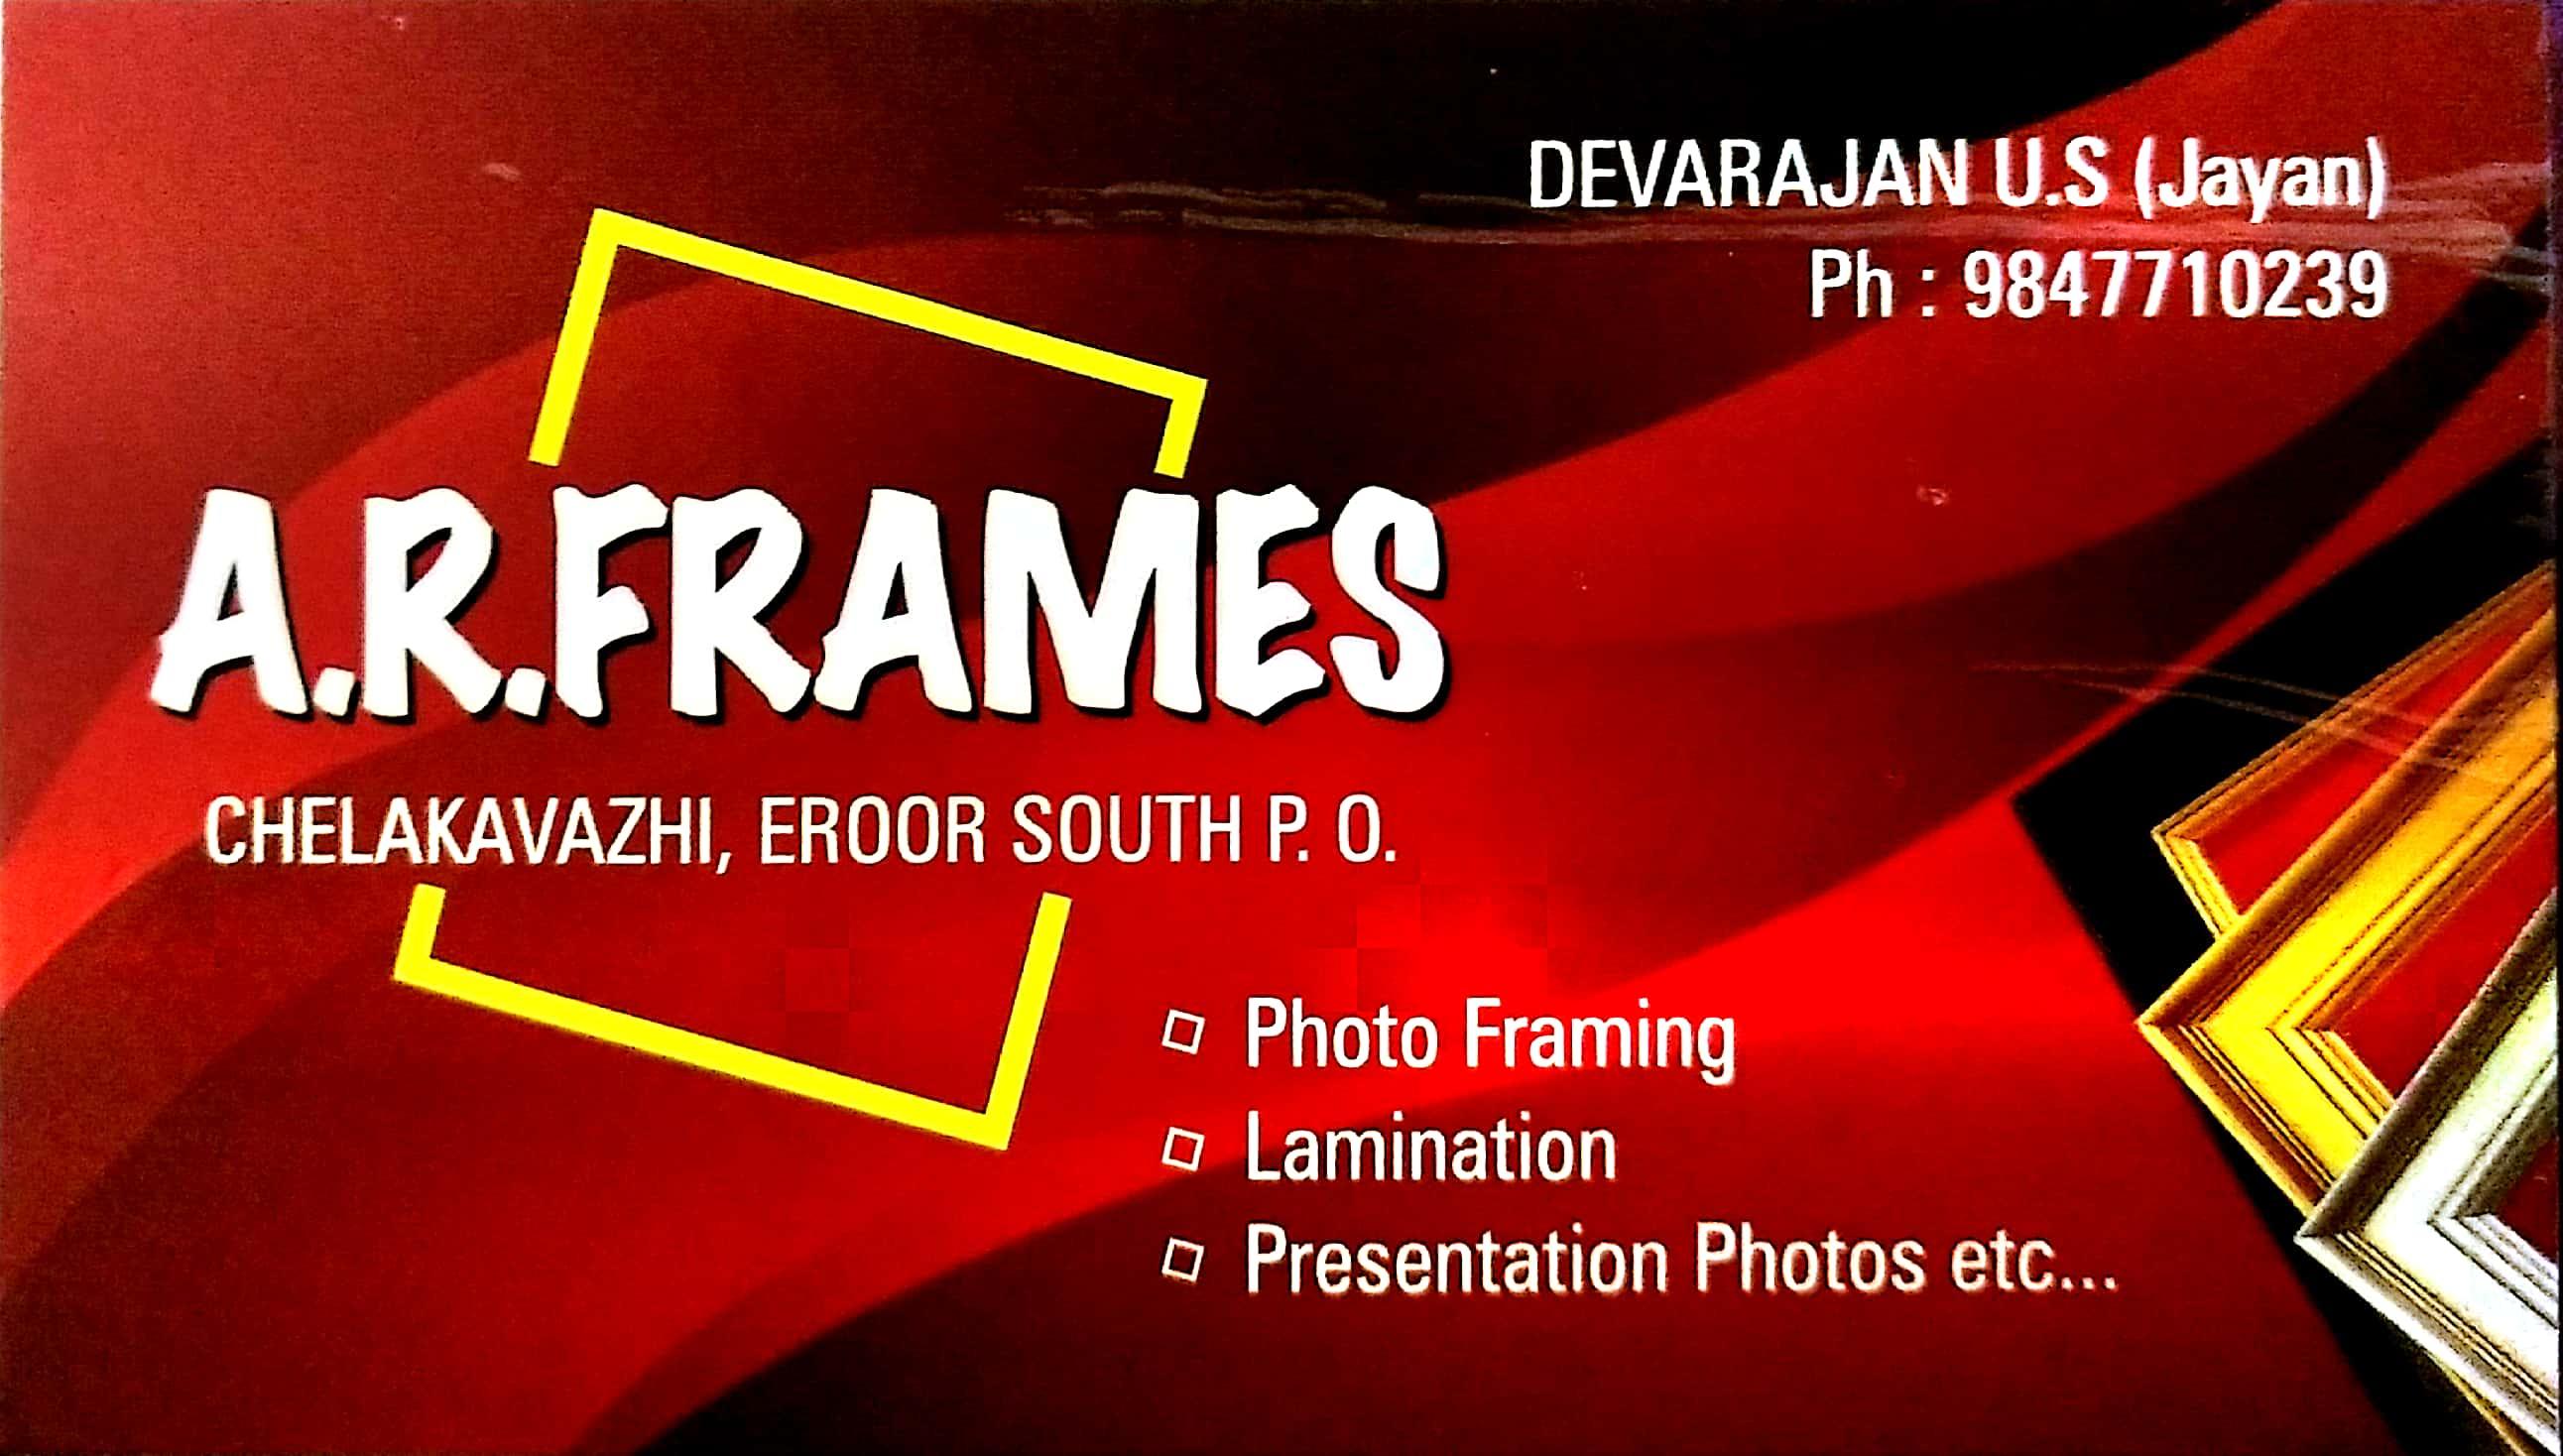 A.R. FRAMES, PHOTO FRAME,  service in Thrippunithura, Ernakulam